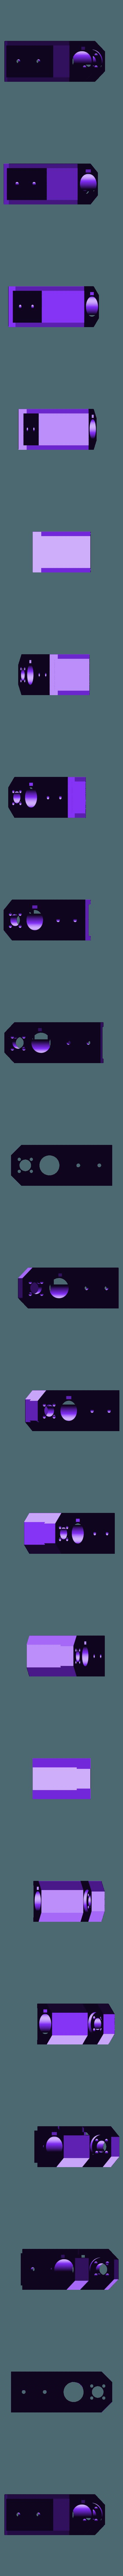 Bed_bracket_1.stl Download free STL file FDM Printer de Kleine Reus 300x300x900 • 3D printable object, Job